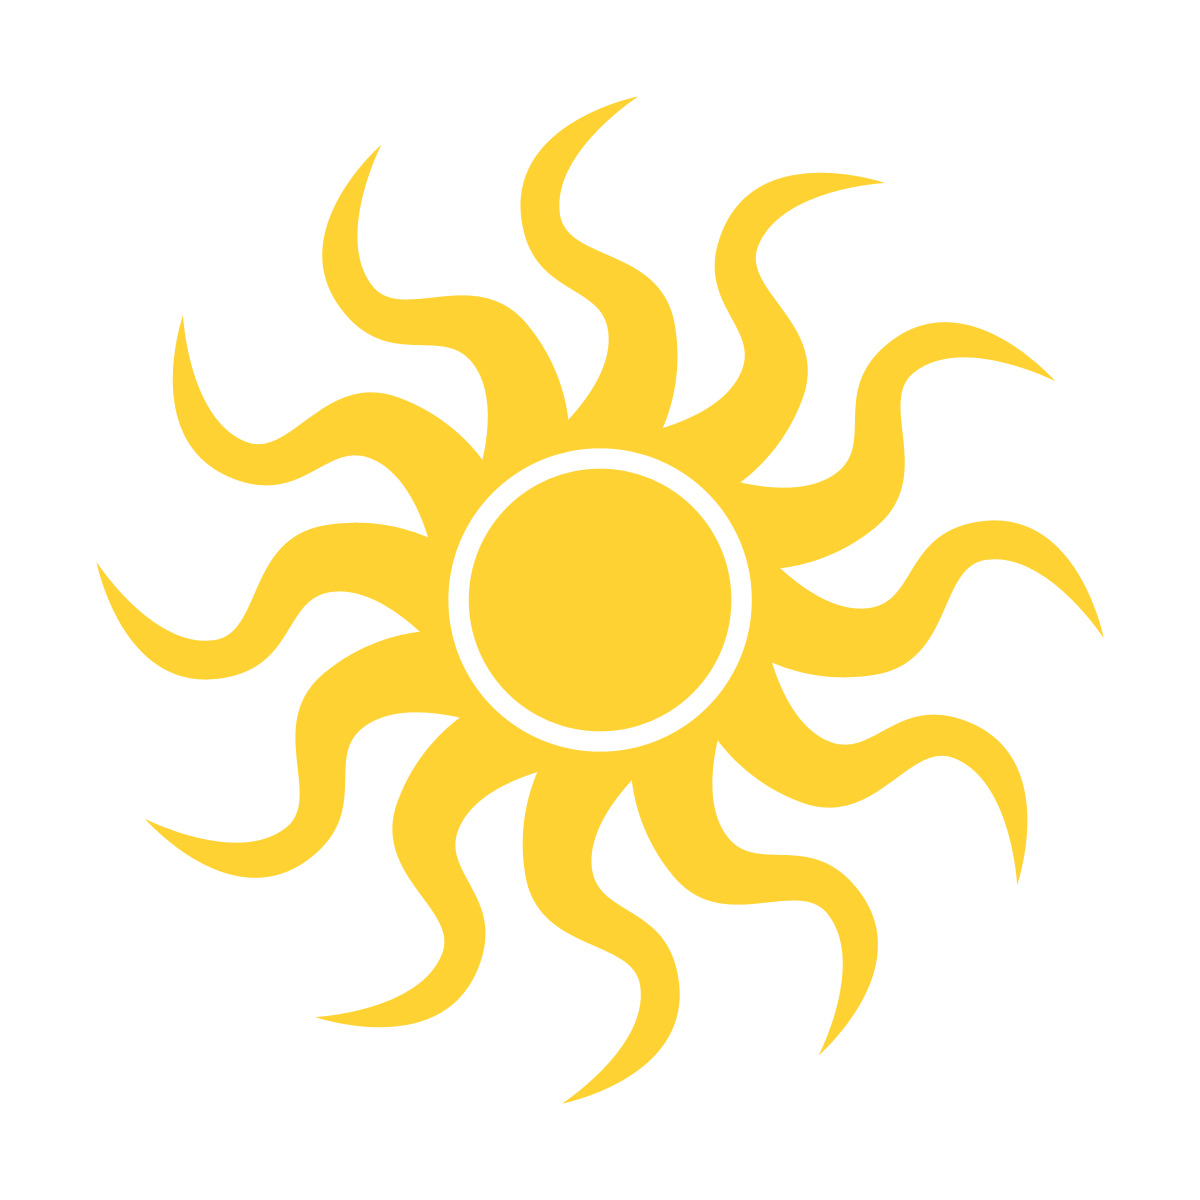 Dusk clipart half sun Group Free Clipart Pictures Images